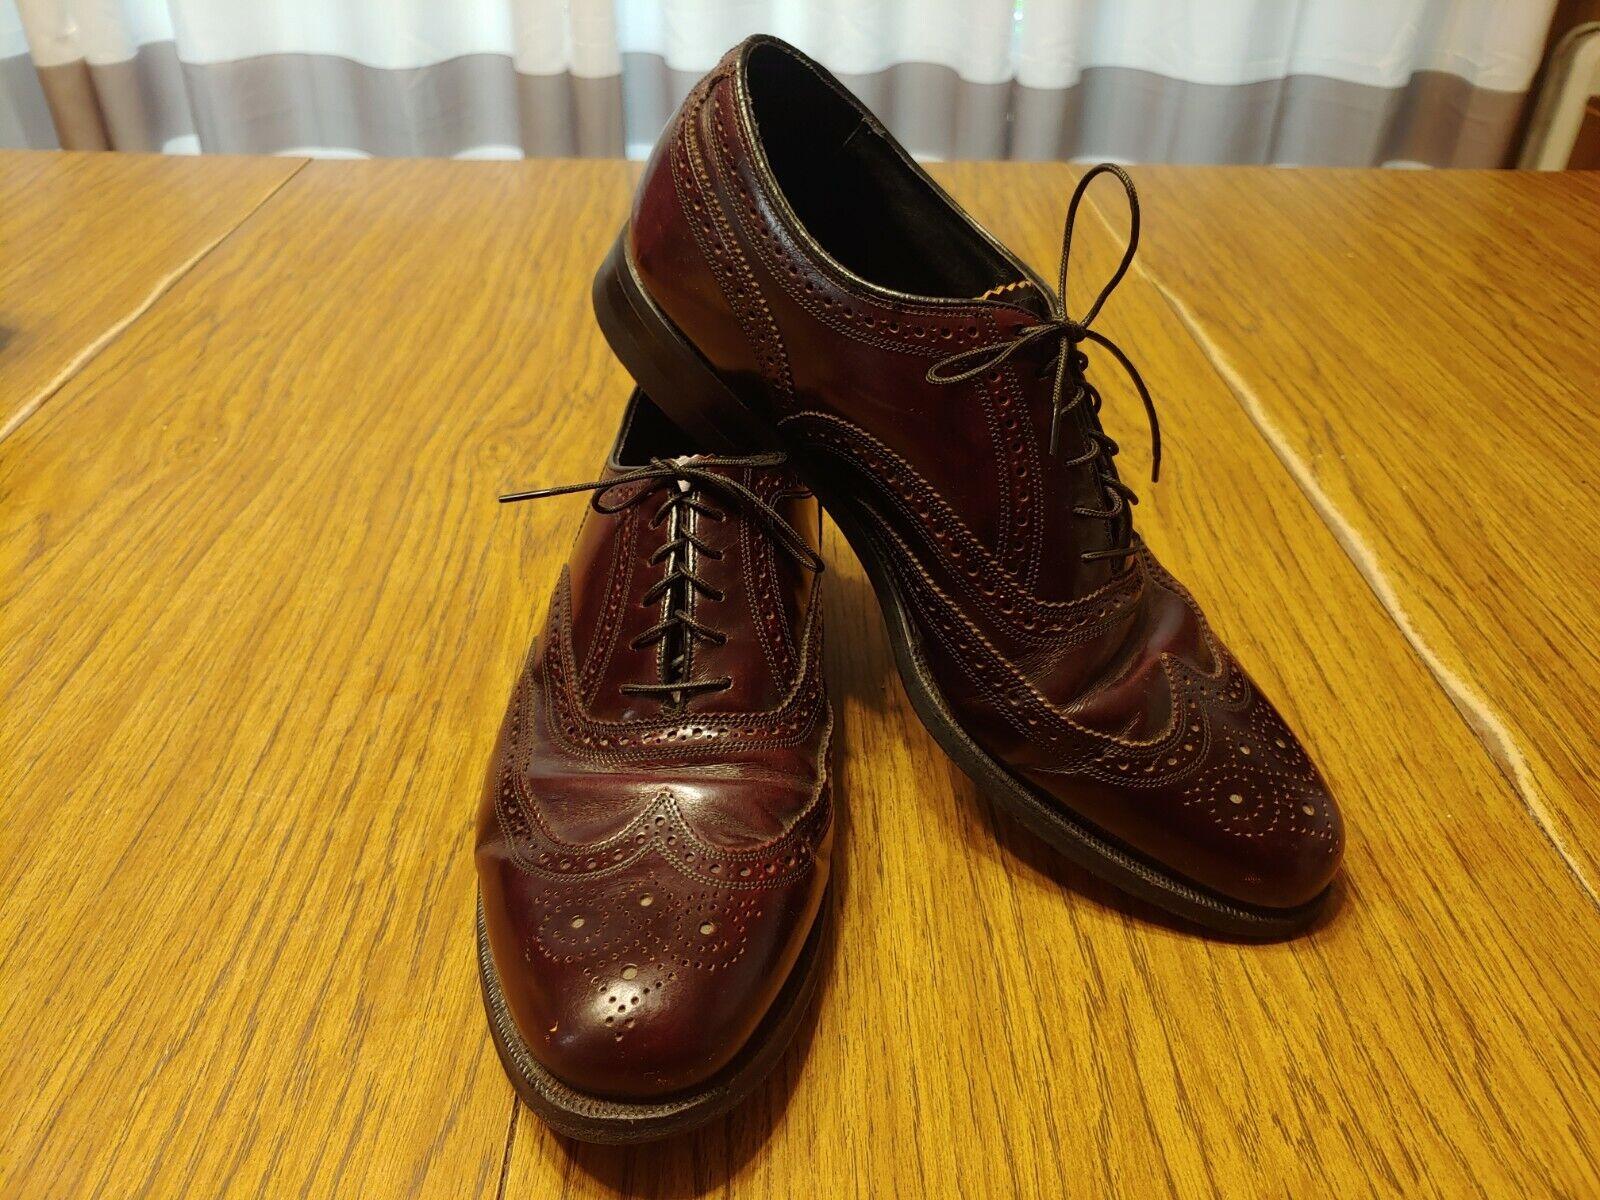 Details about  /Florsheim Burgundy Leather Slip On Penny Loafers Dress Shoes Men/'s 9.5 D